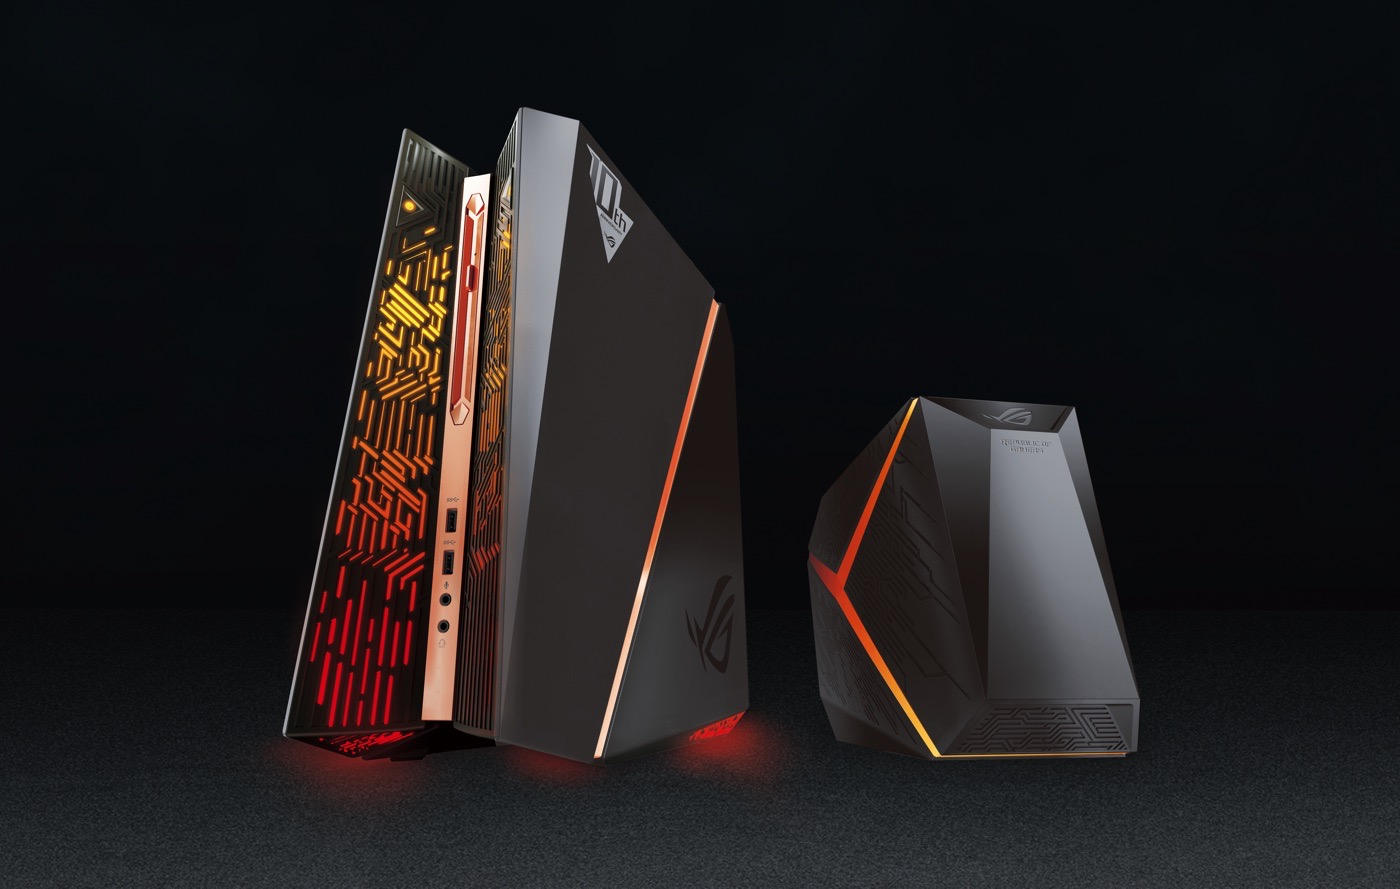 Asus Tower PC Gaming